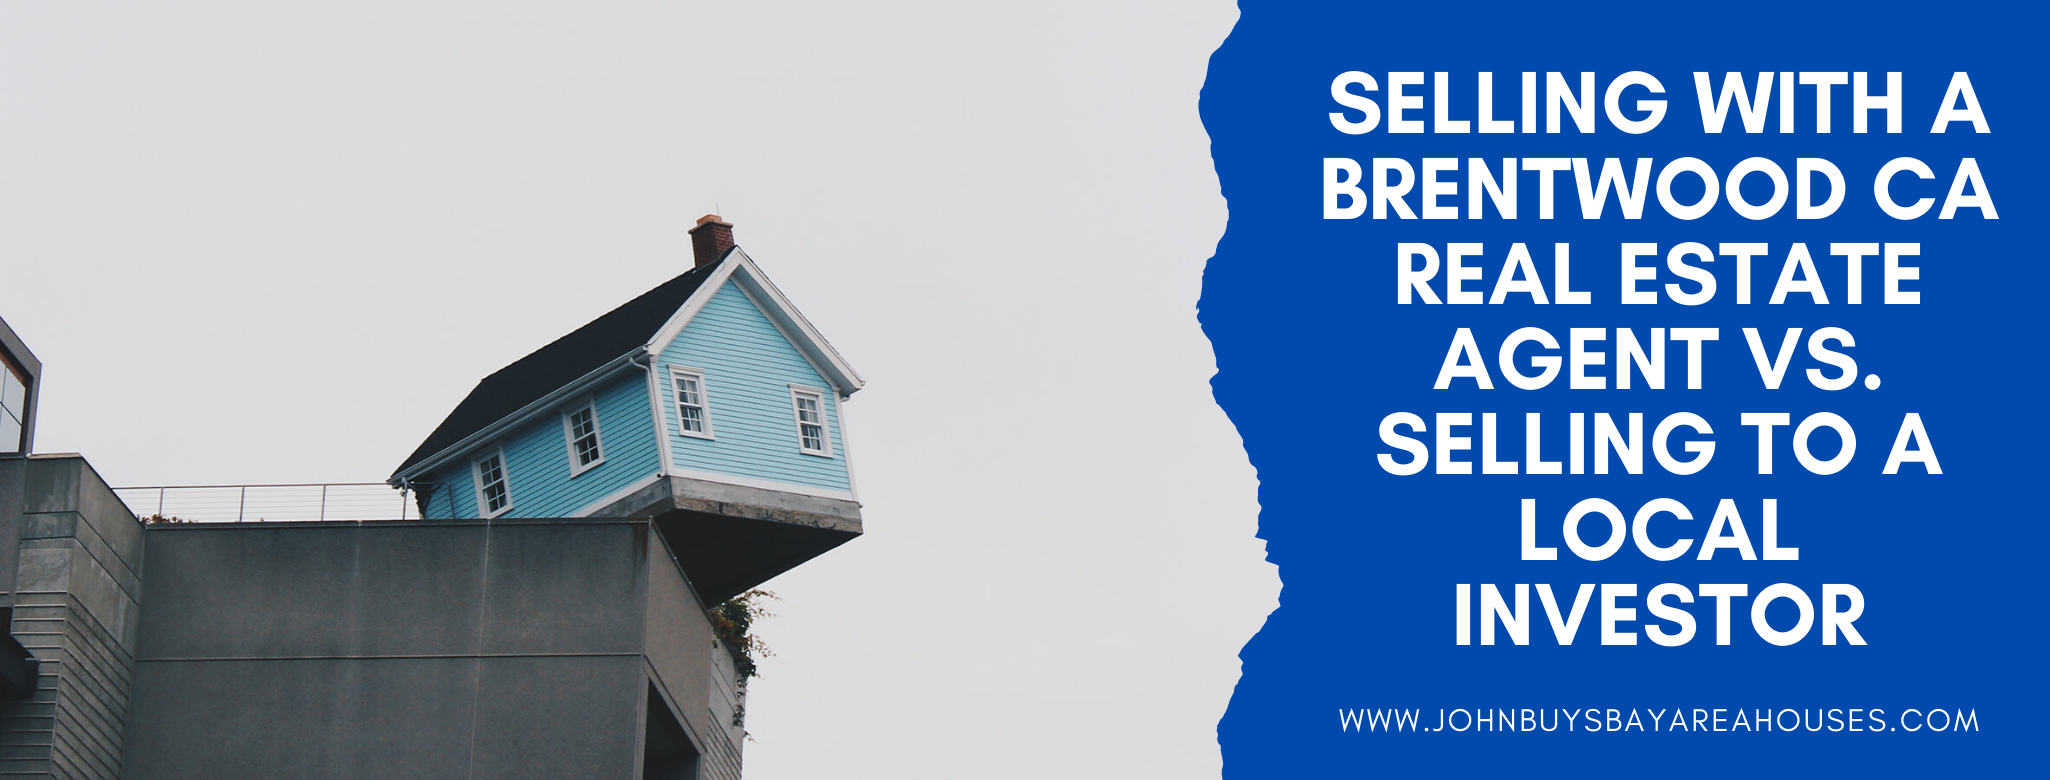 We buy properties in Brentwood CA